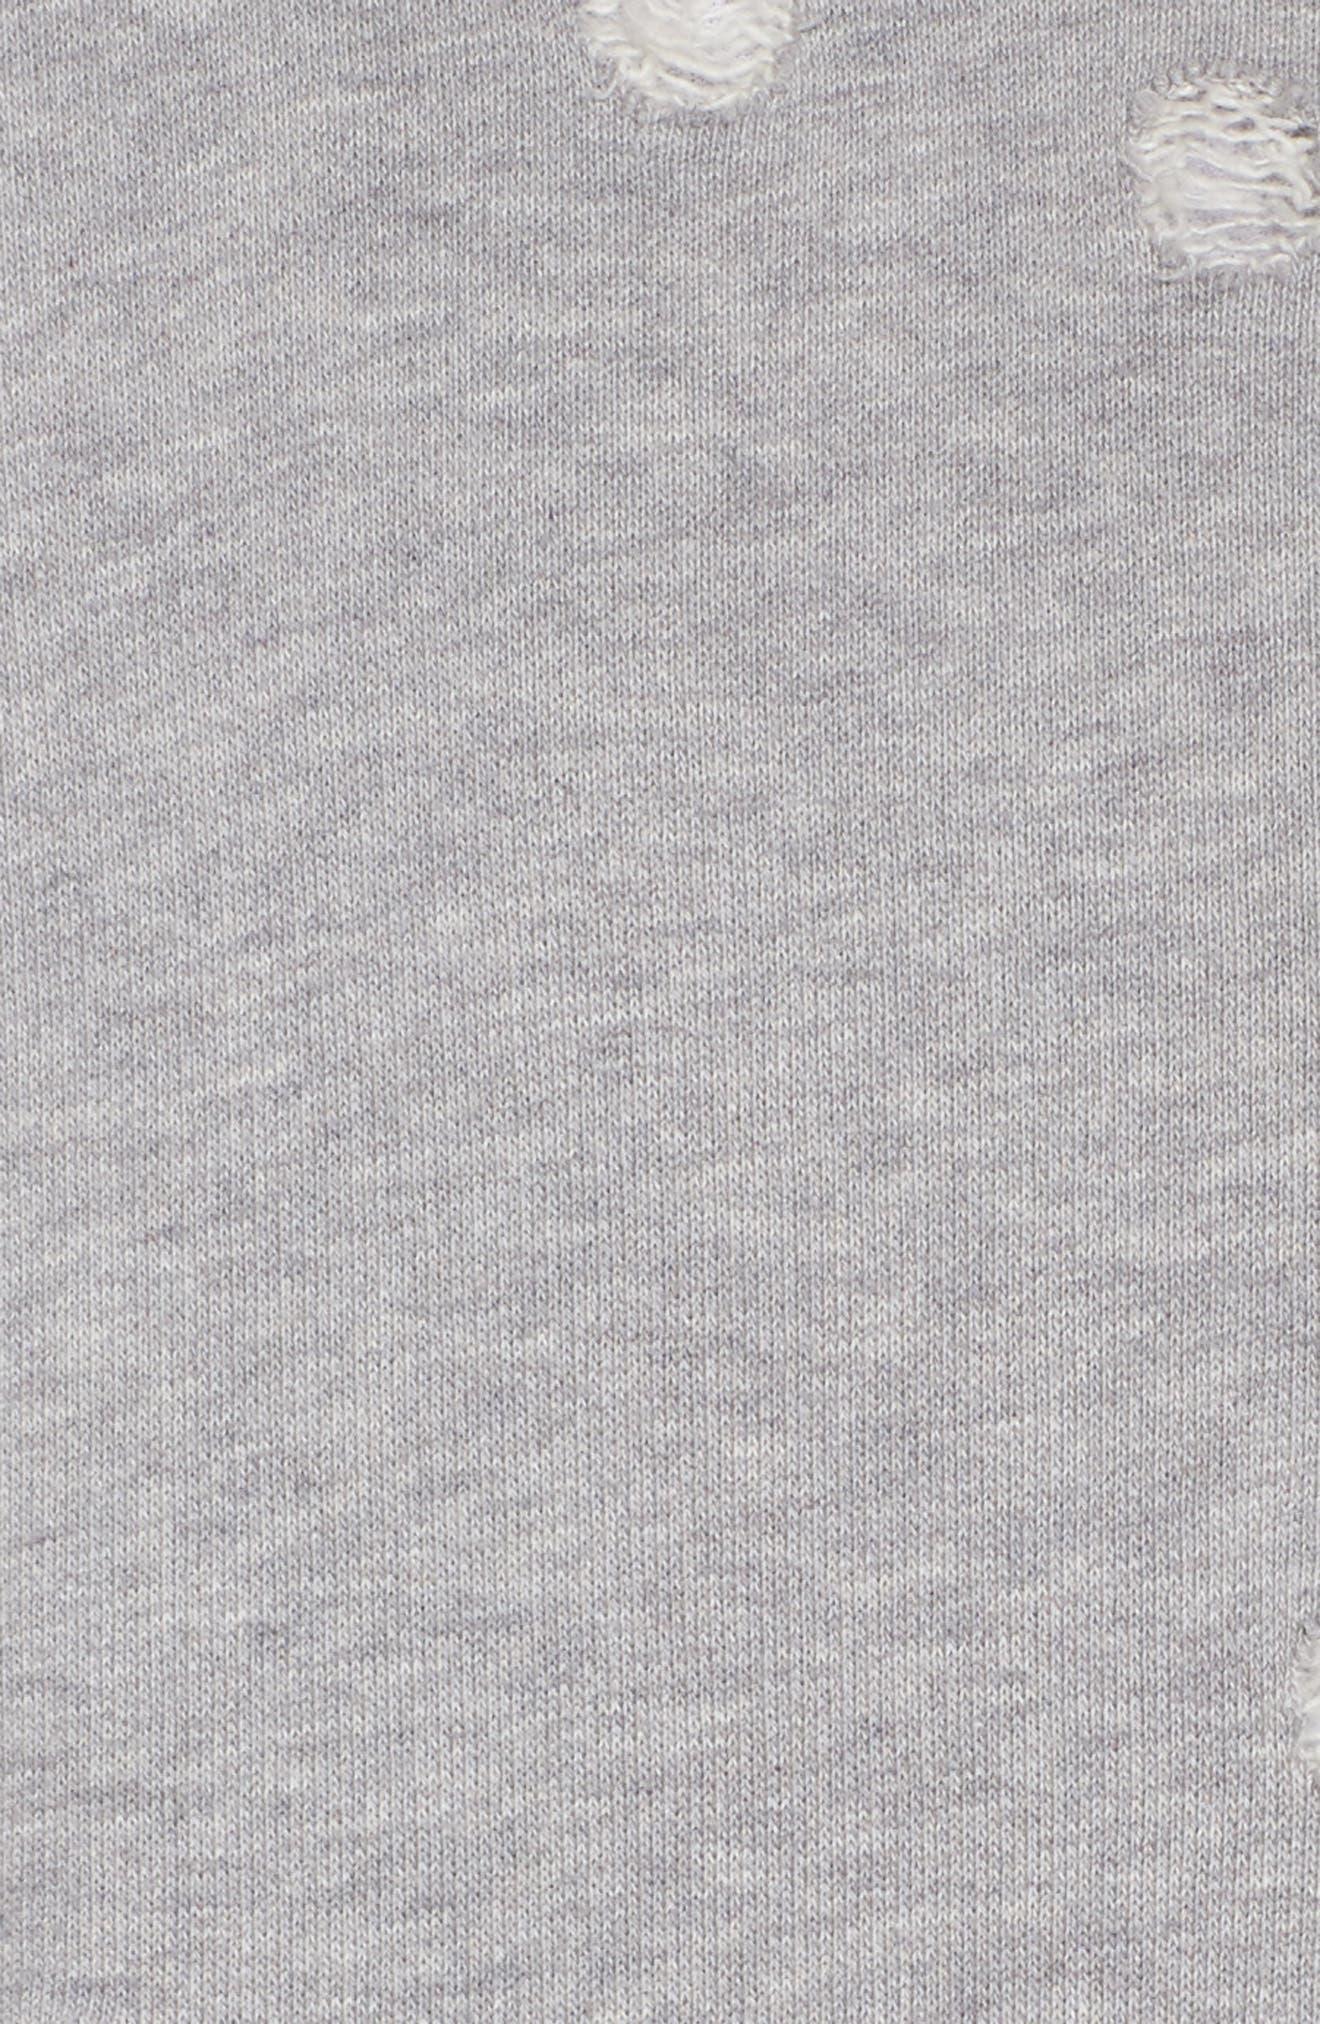 Distressed Zip Sweatshirt,                             Alternate thumbnail 7, color,                             Heather Grey